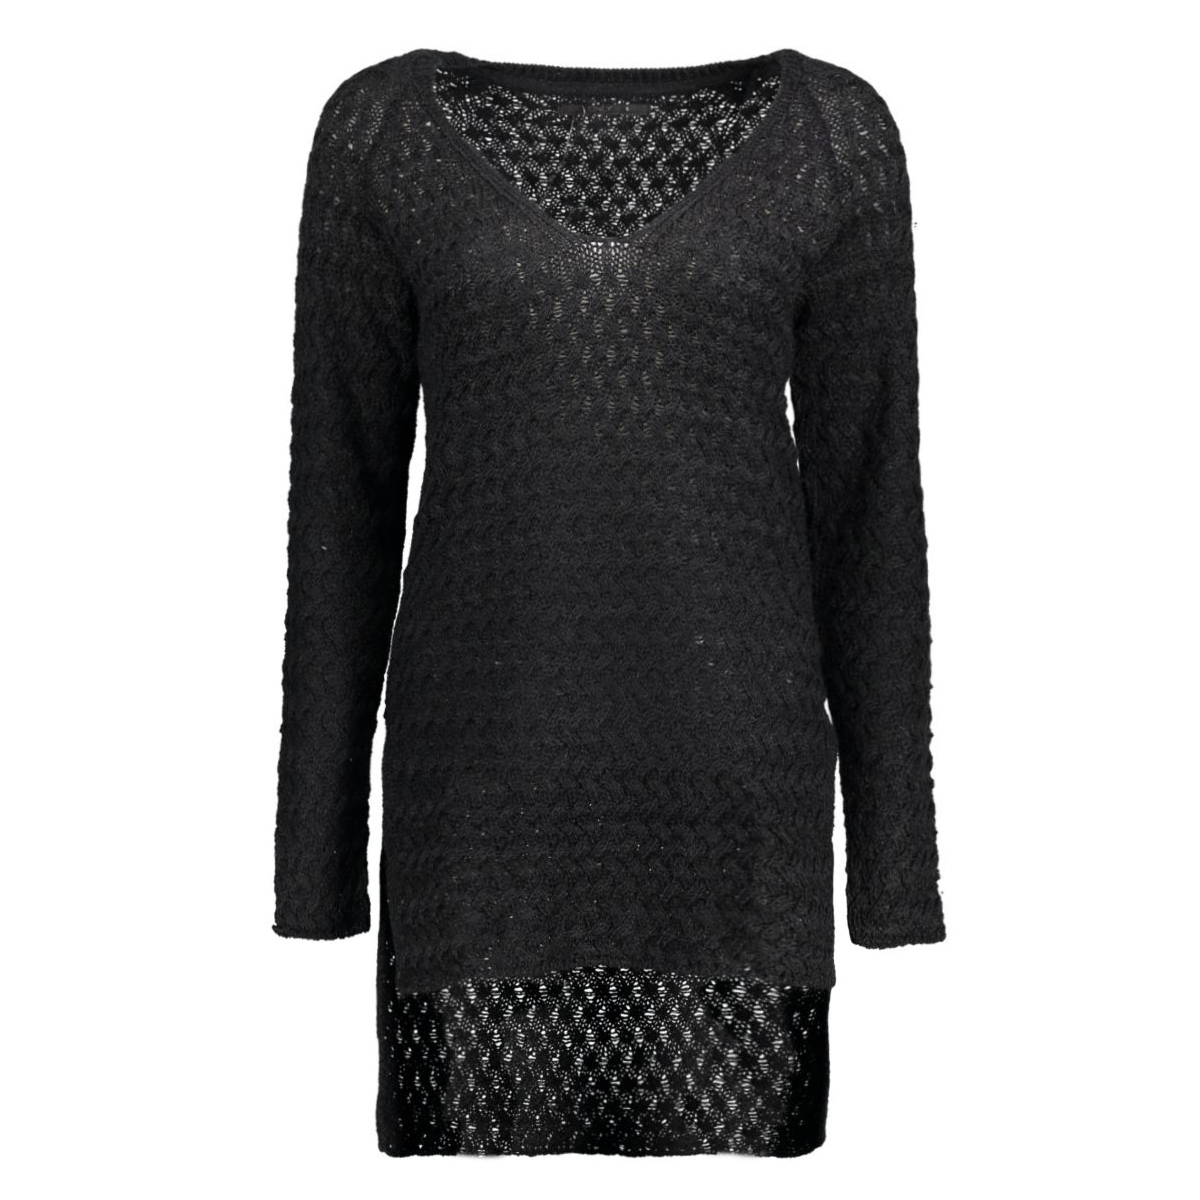 onllima l/s v-neck pullover knt 15120950 only trui black